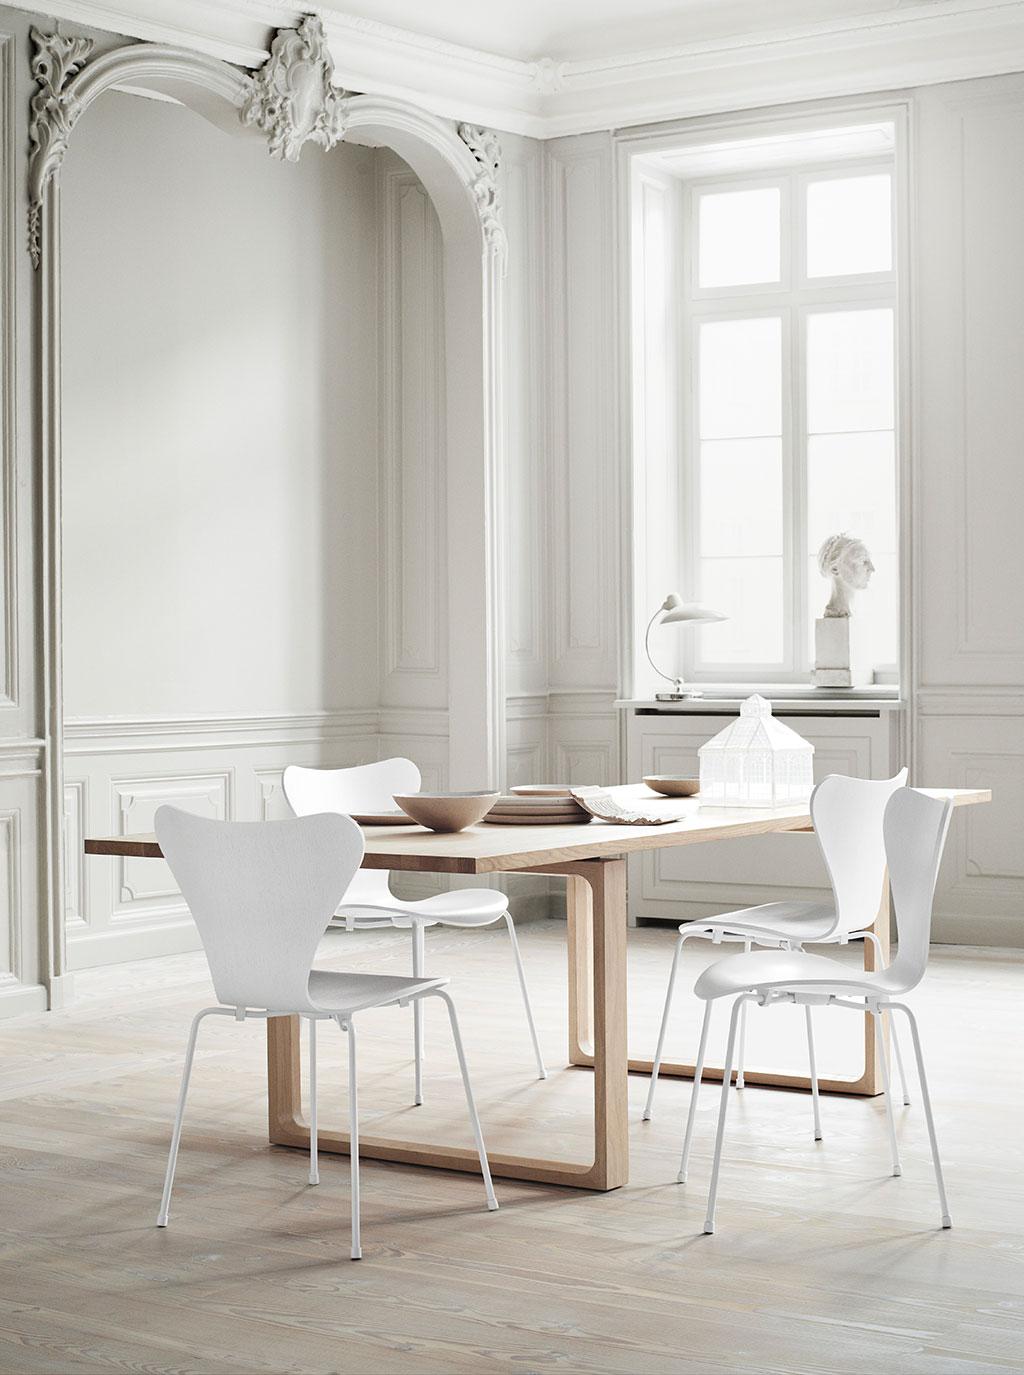 Designer Arne Jacobsens Siebener Stuhl, auch bekannt als Modell 3107,